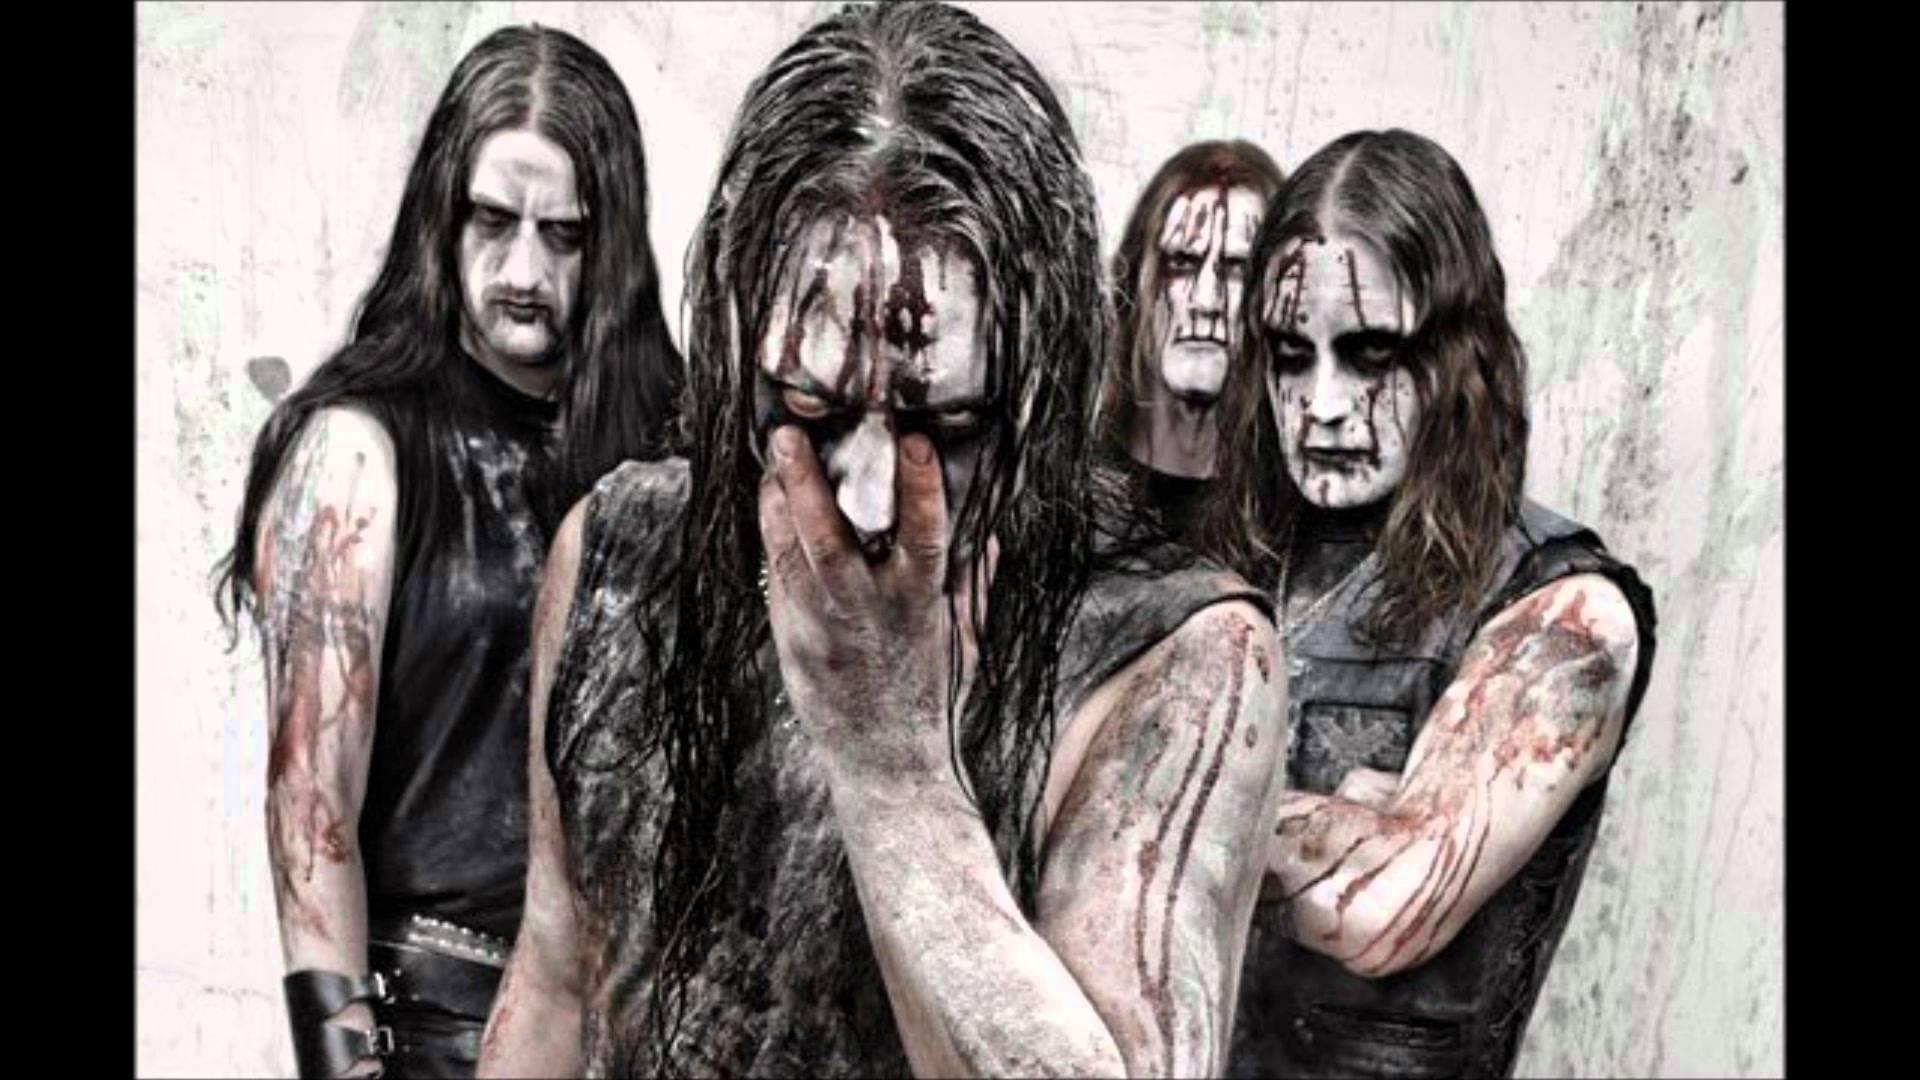 Images of Marduk | 1920x1080